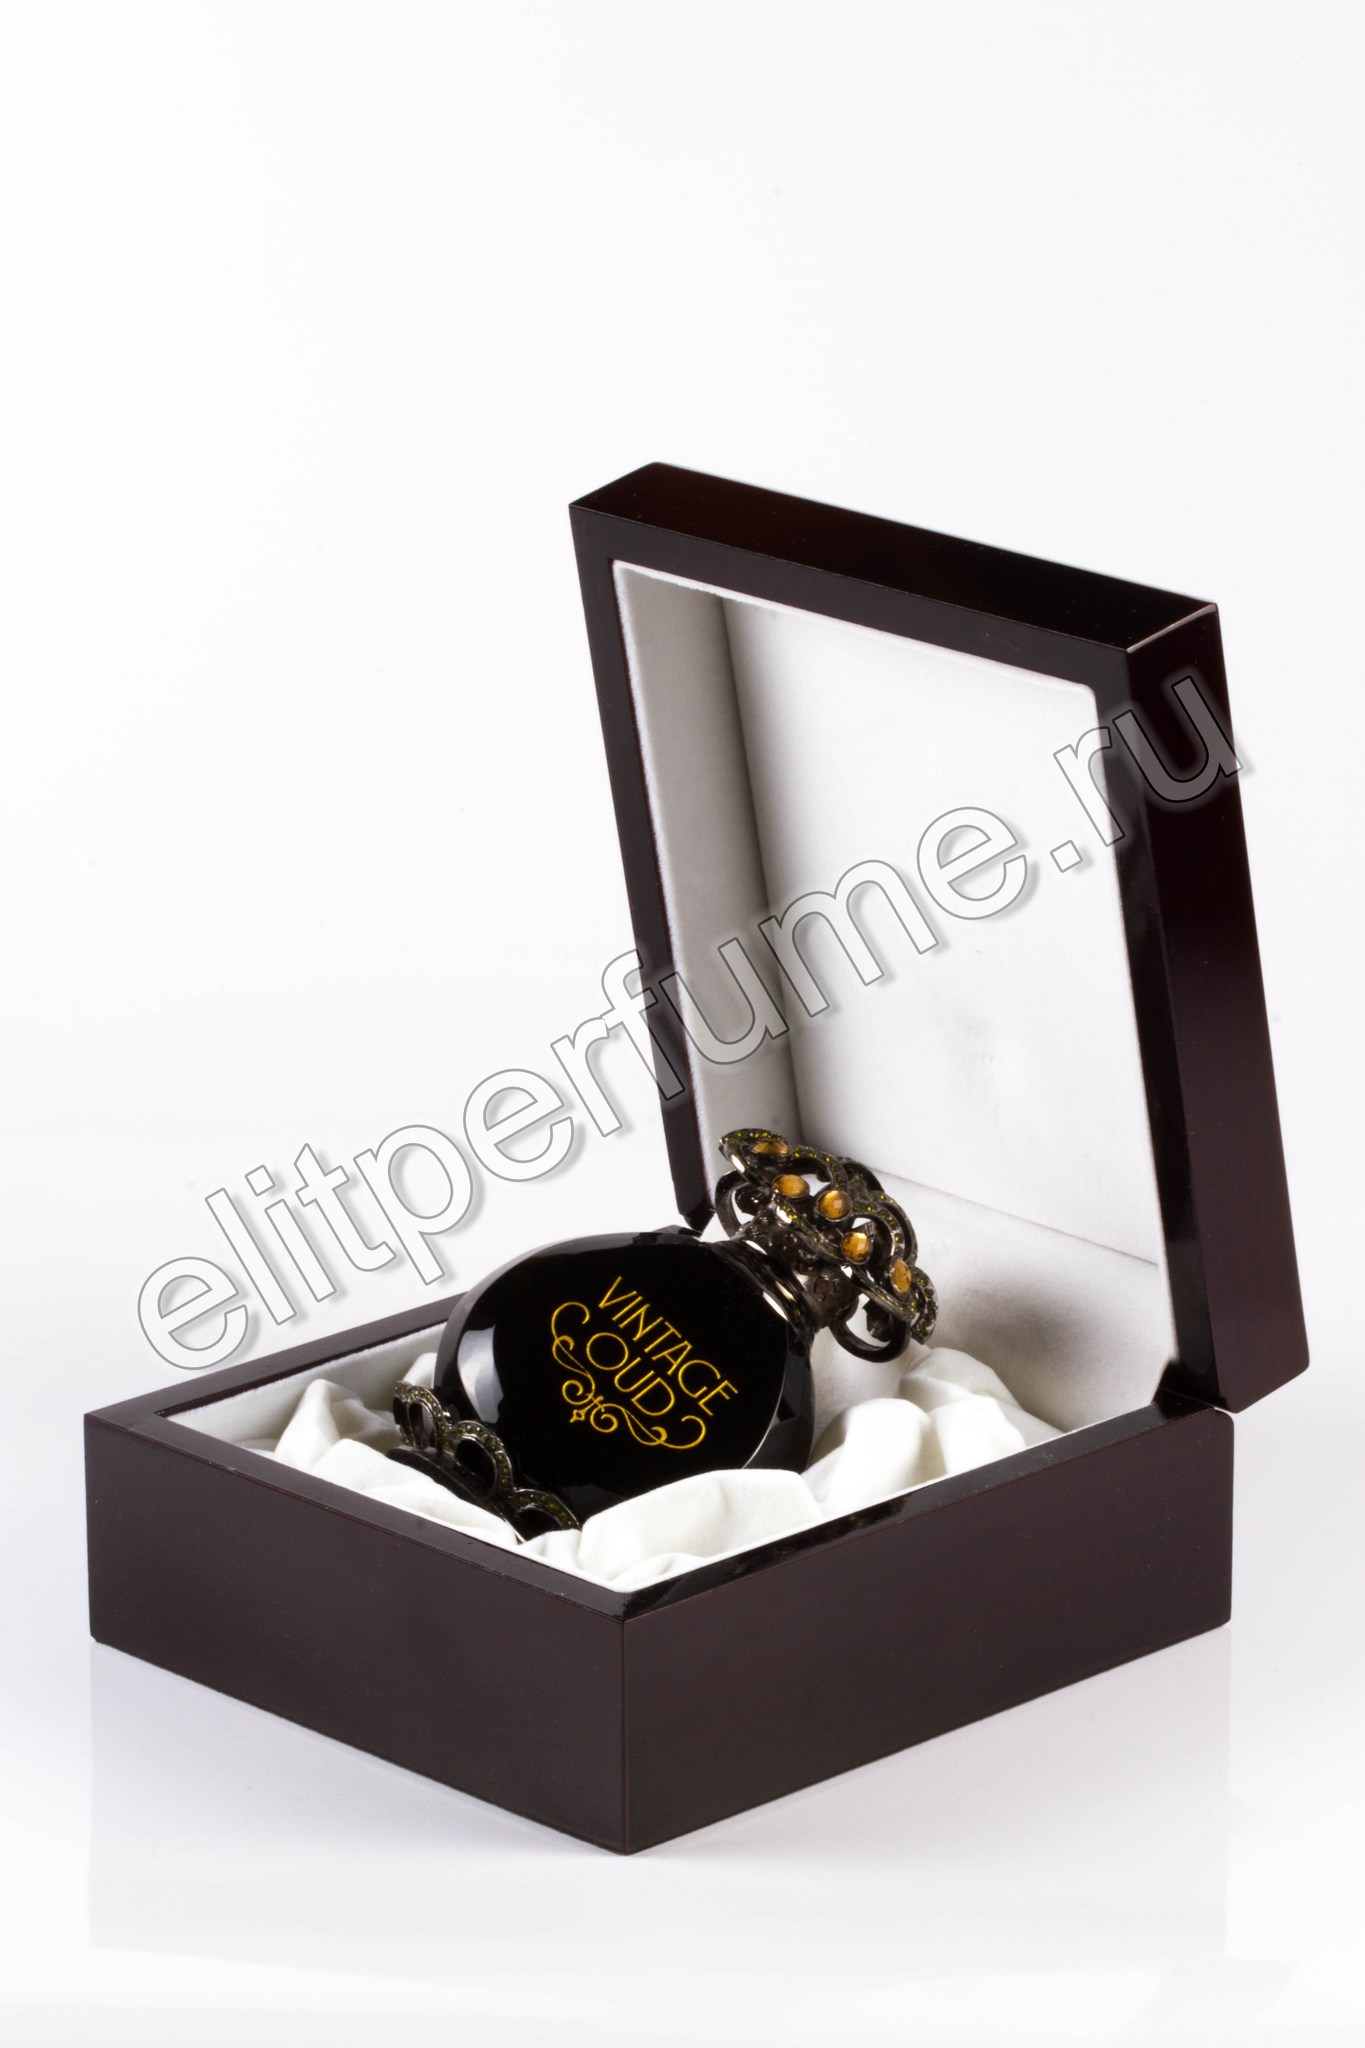 Vintage Oud  Винтаж Уд 12 мл арабские масляные духи от Арабеск Парфюм Arabesque Perfumes